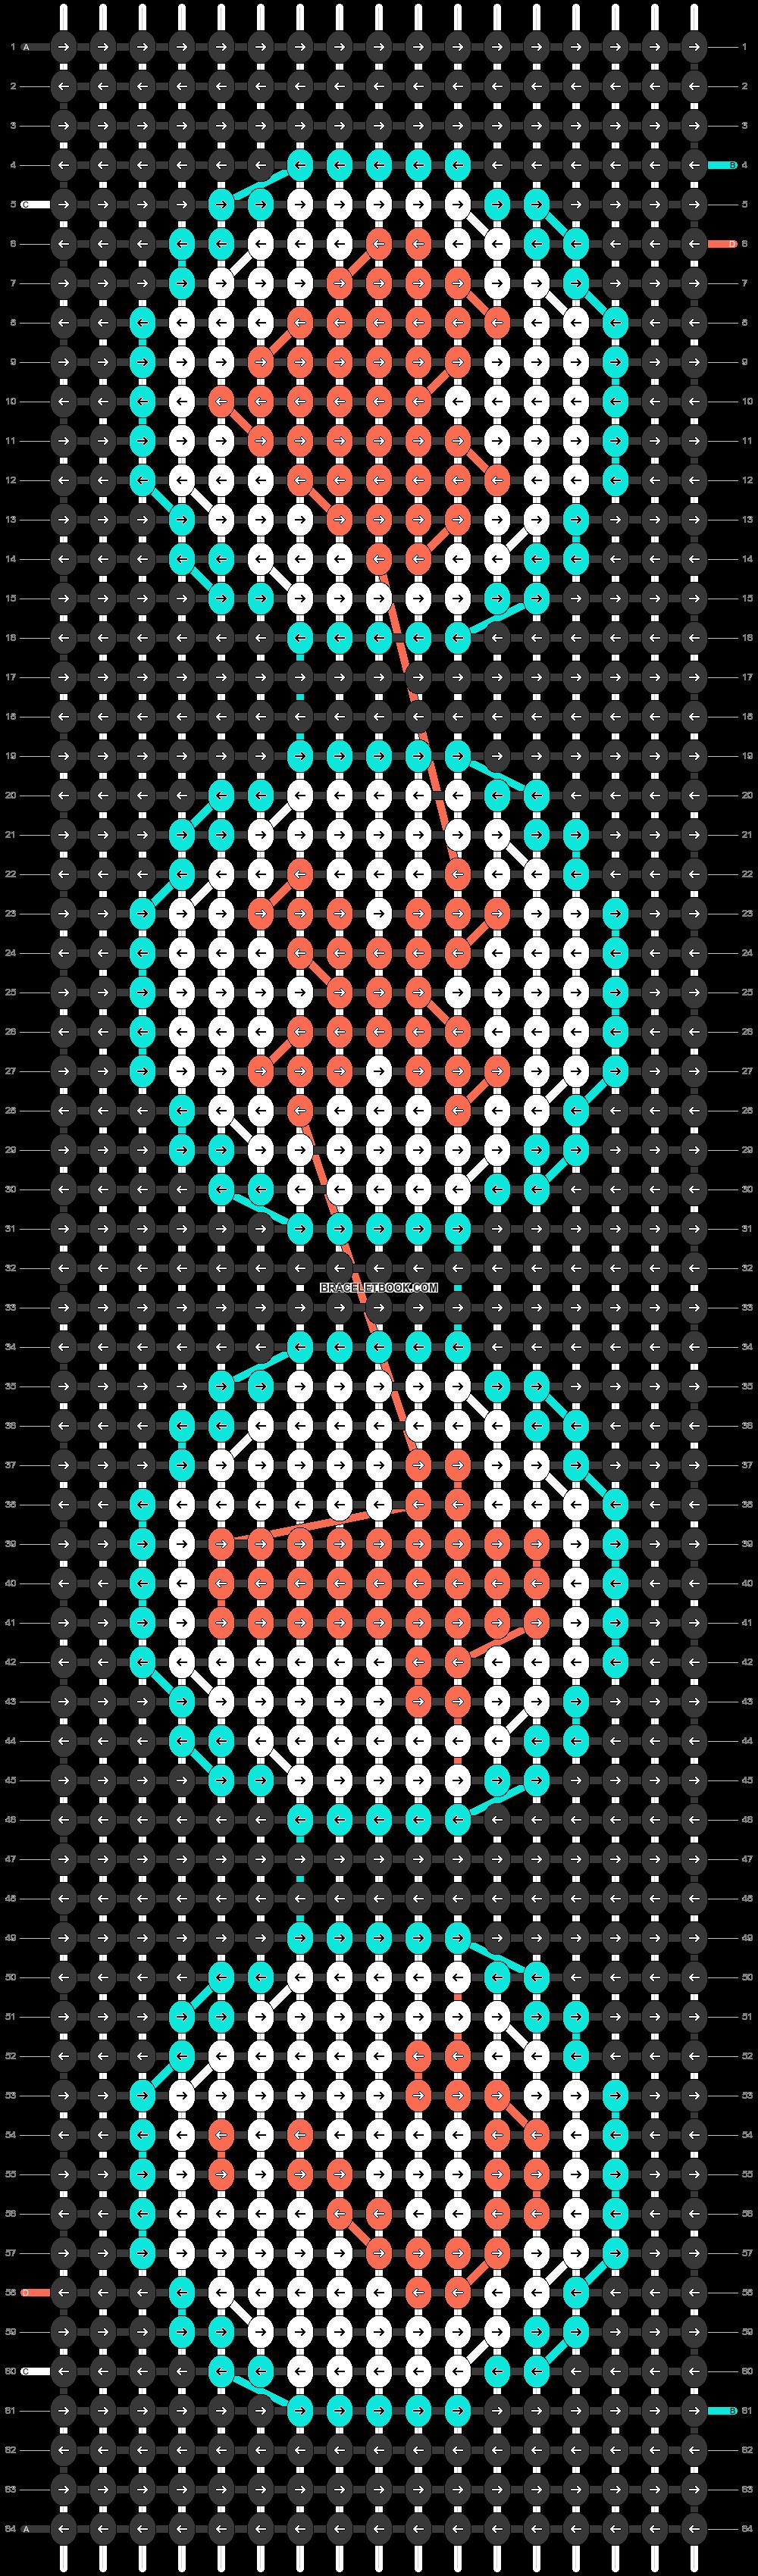 Alpha Pattern #22091 added by AEast158